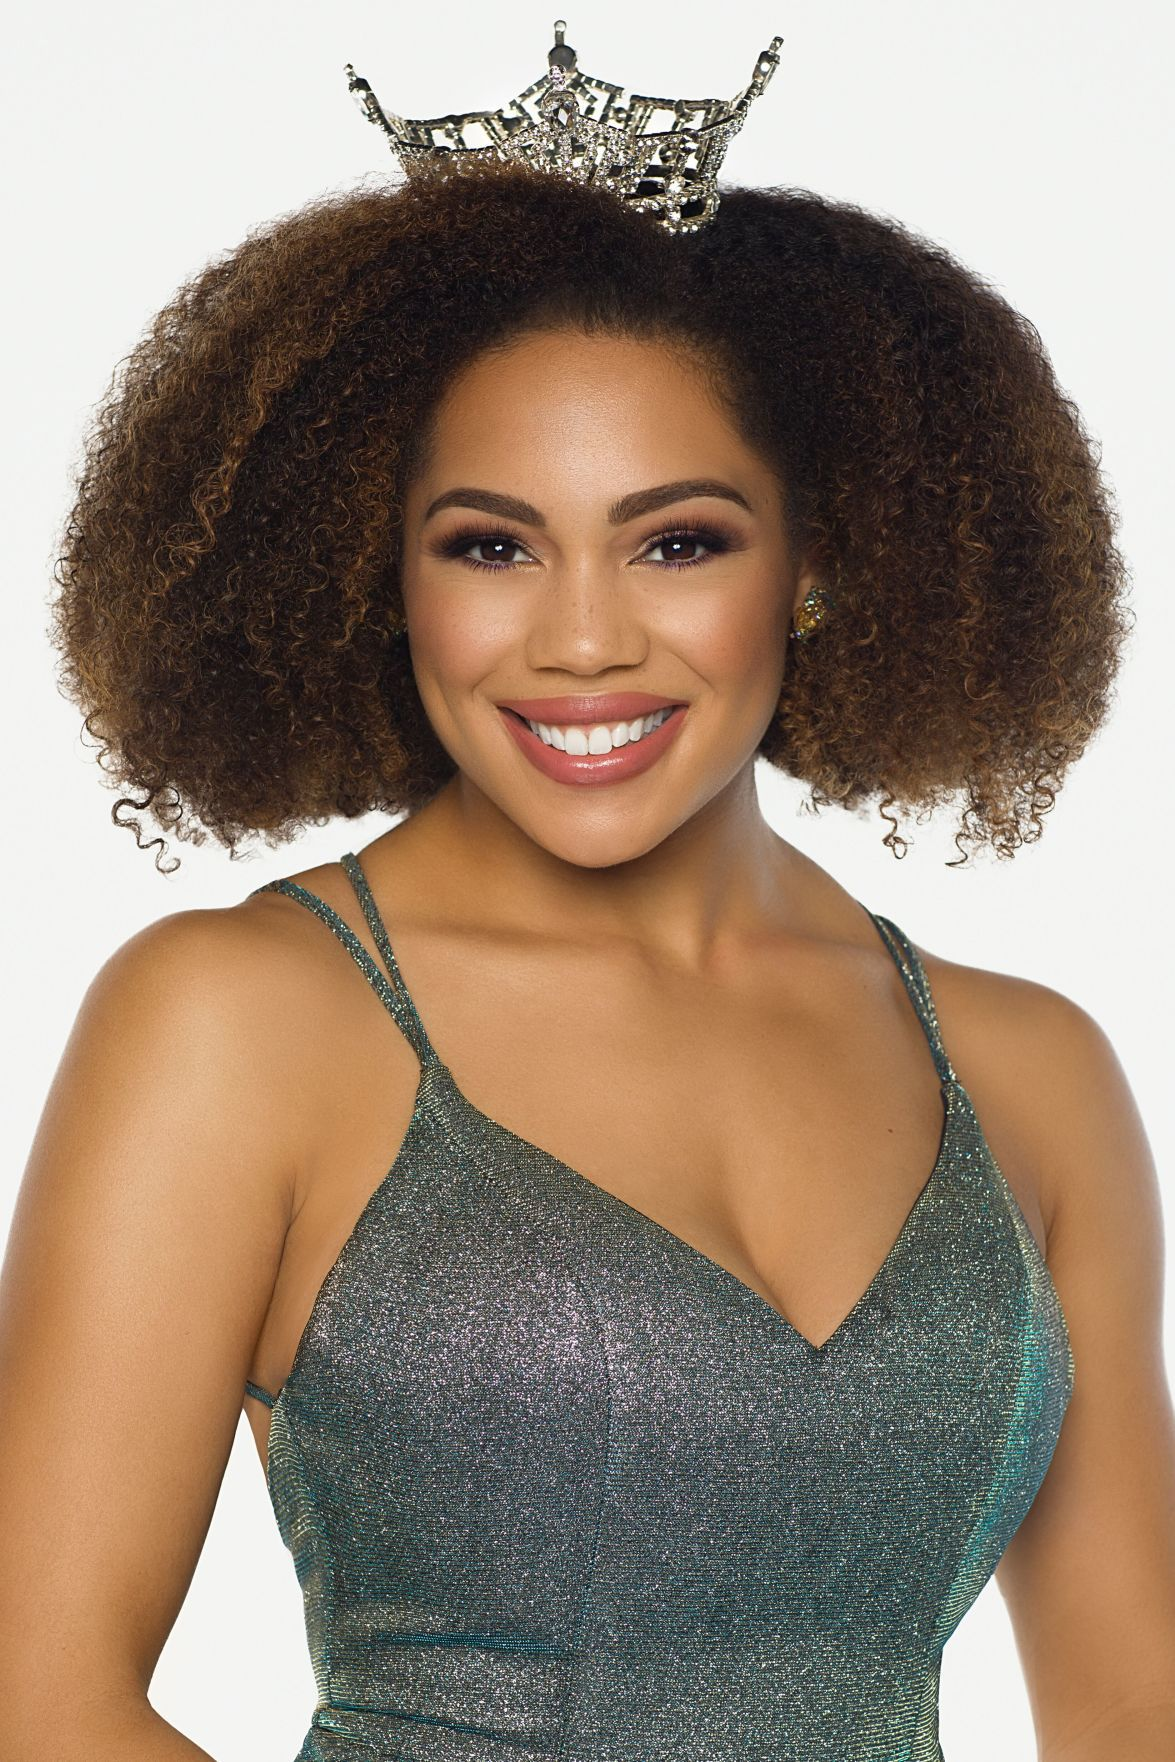 Miss Iowa 2018 Mikhayla Hughes-Shaw